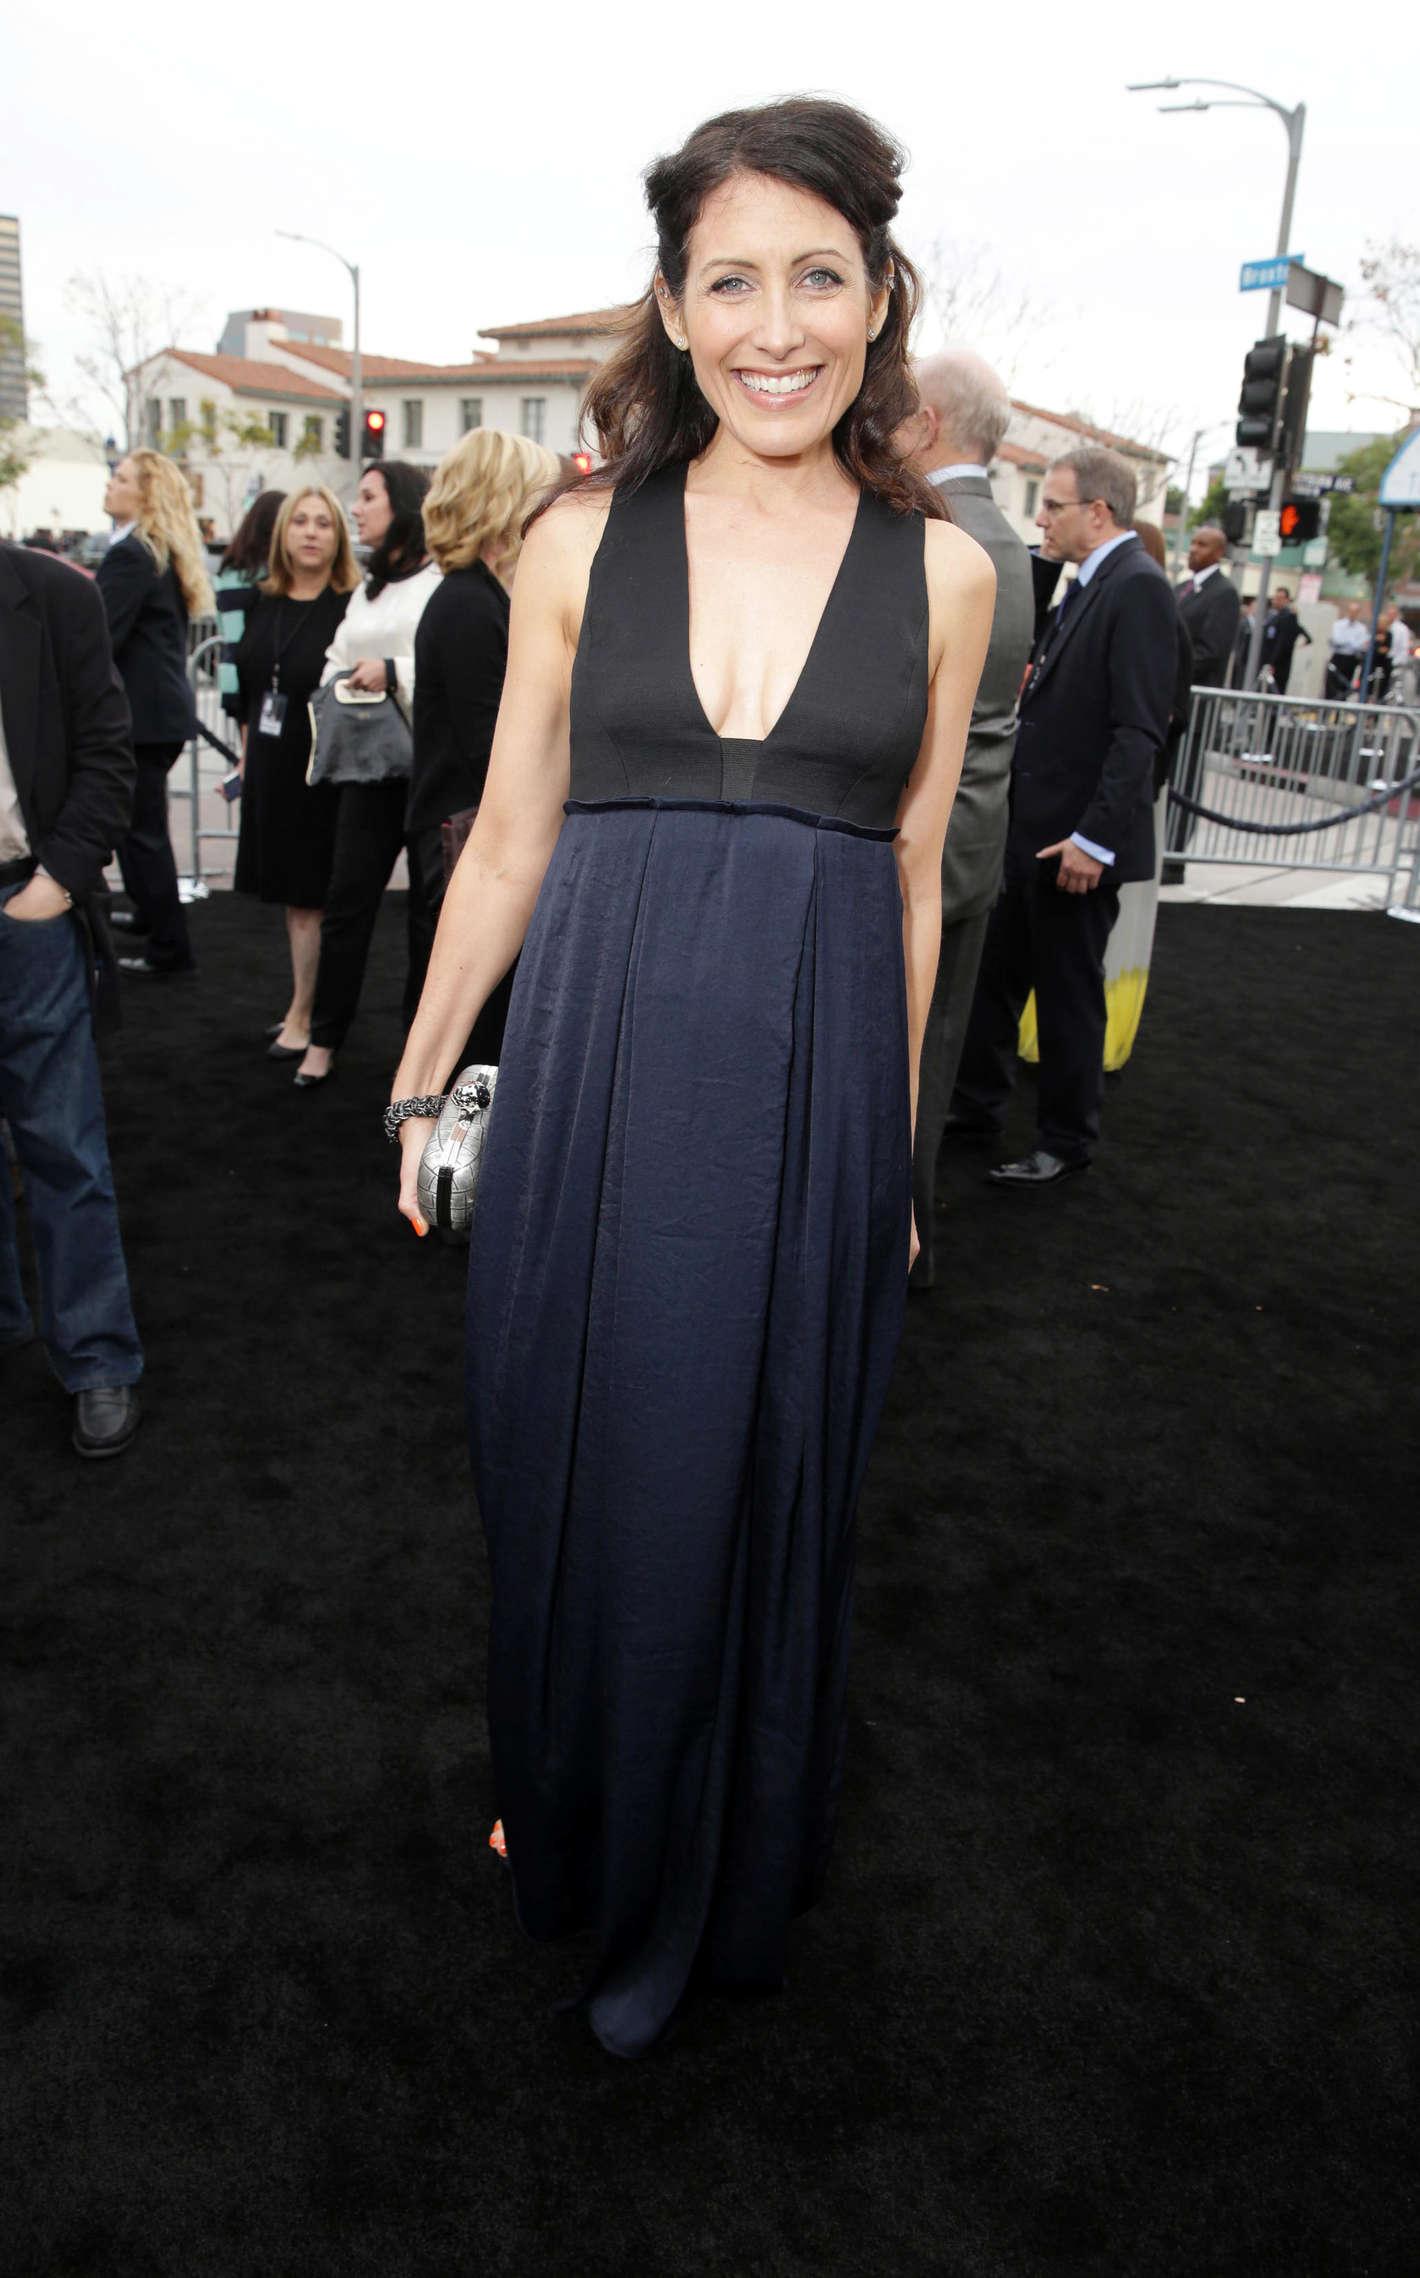 Lisa Edelstein Transcendence premiere in Los Angeles